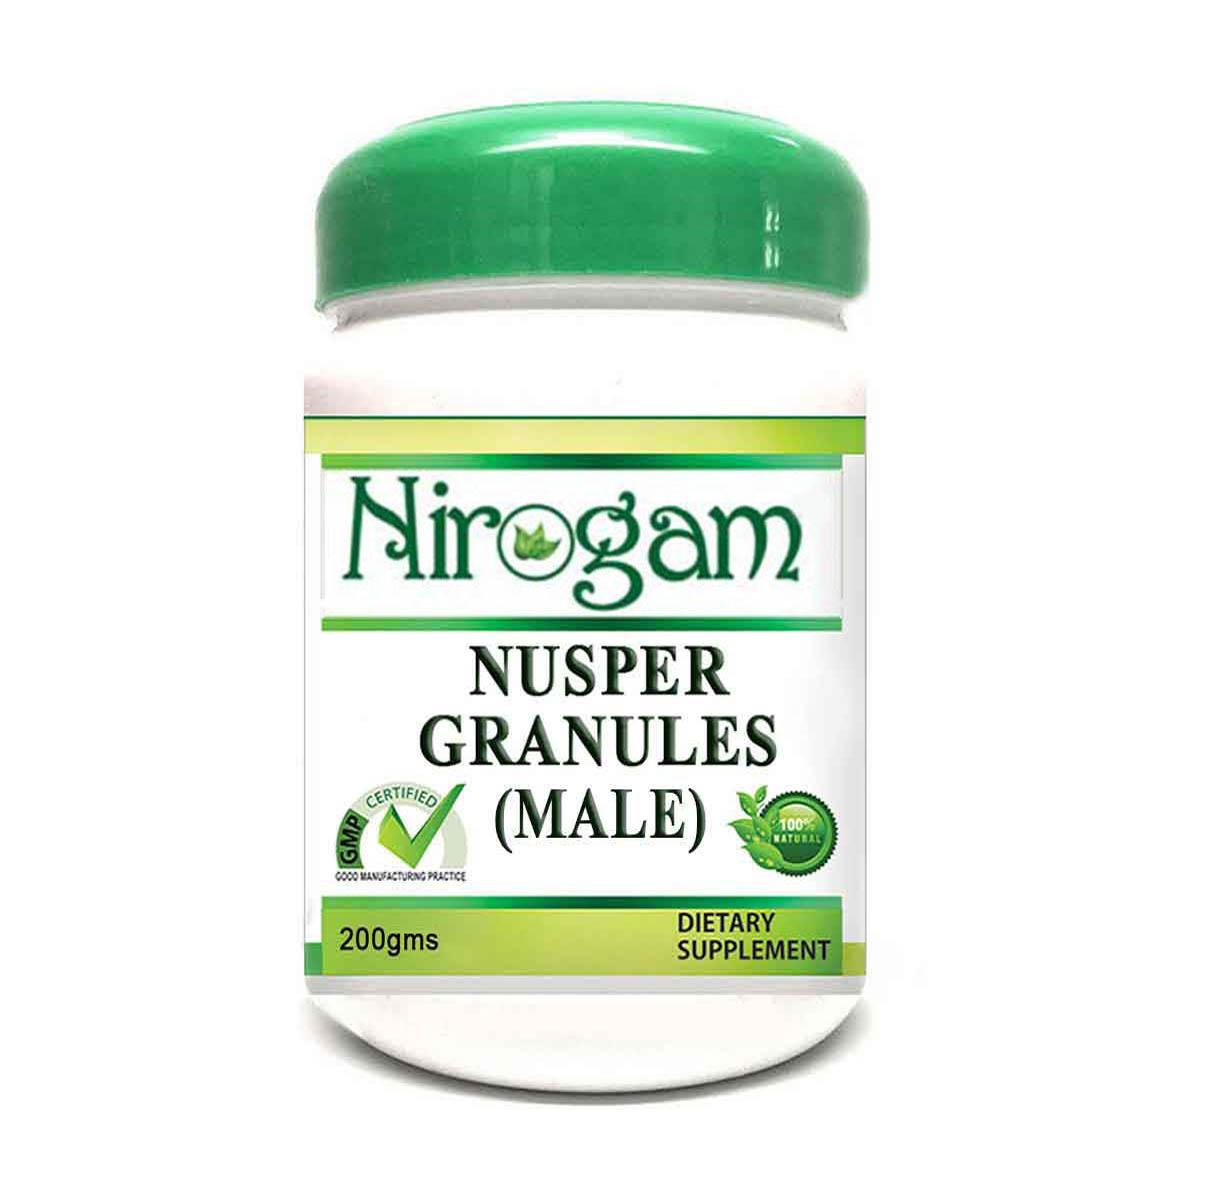 Nusper Granules